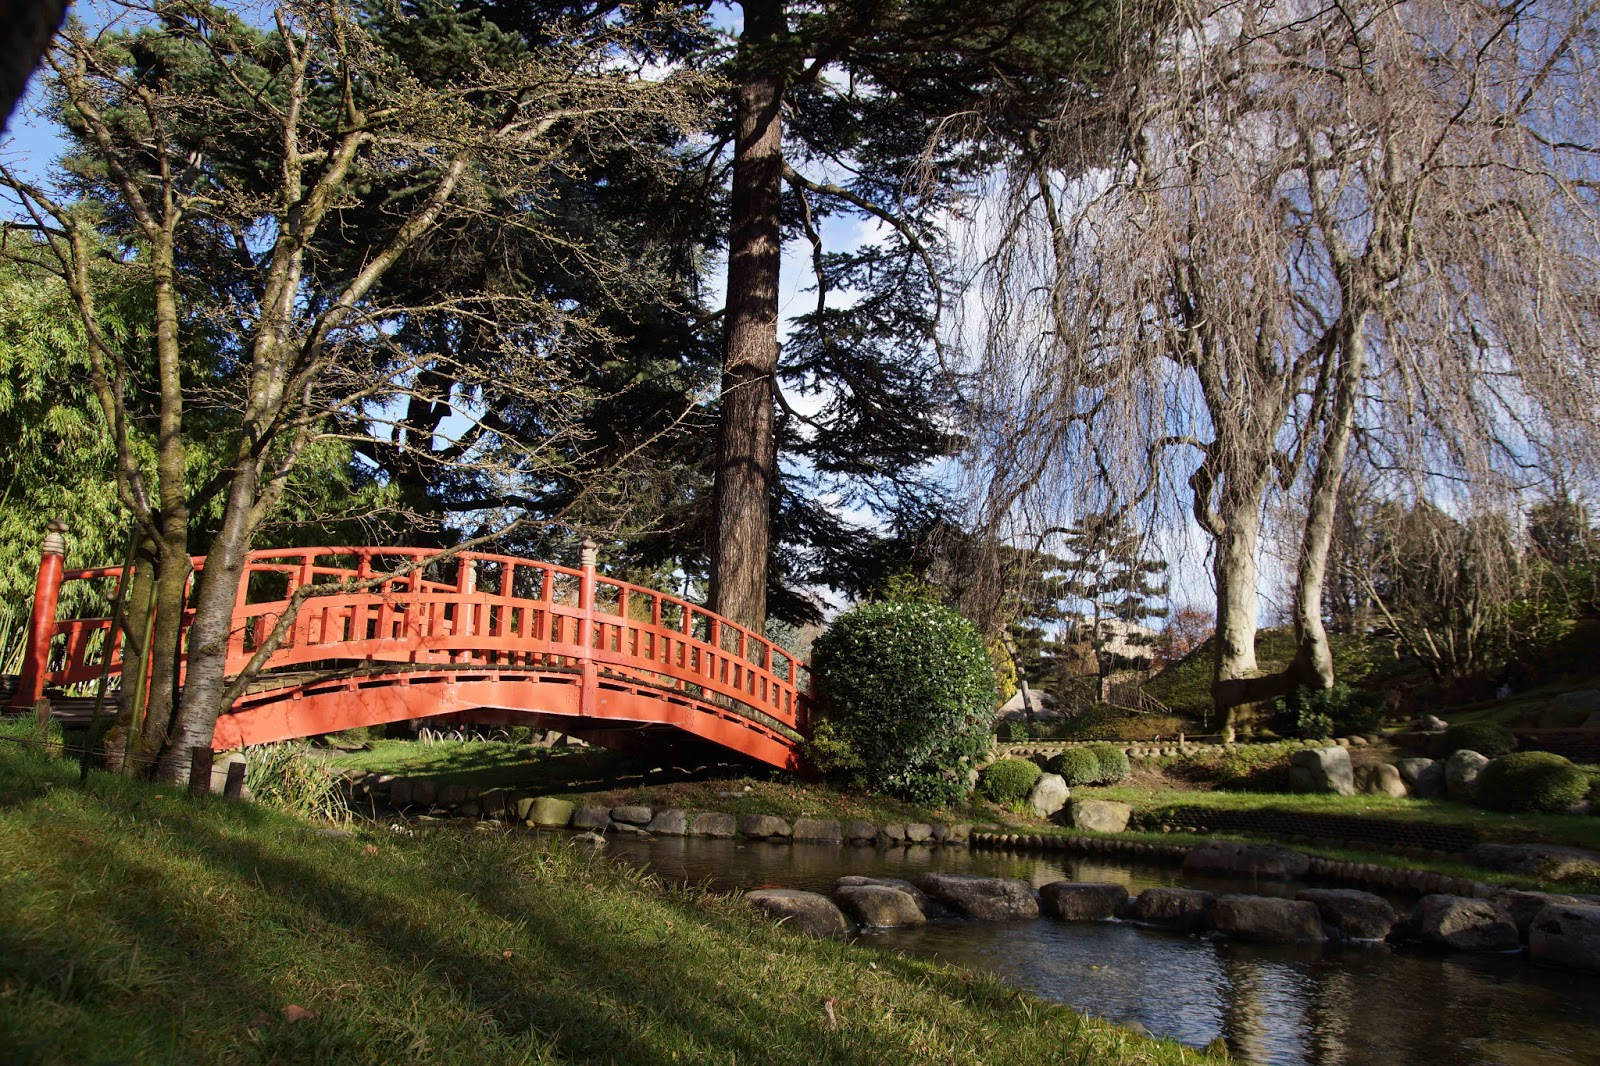 Europe au pif: Albert Kahn gardens